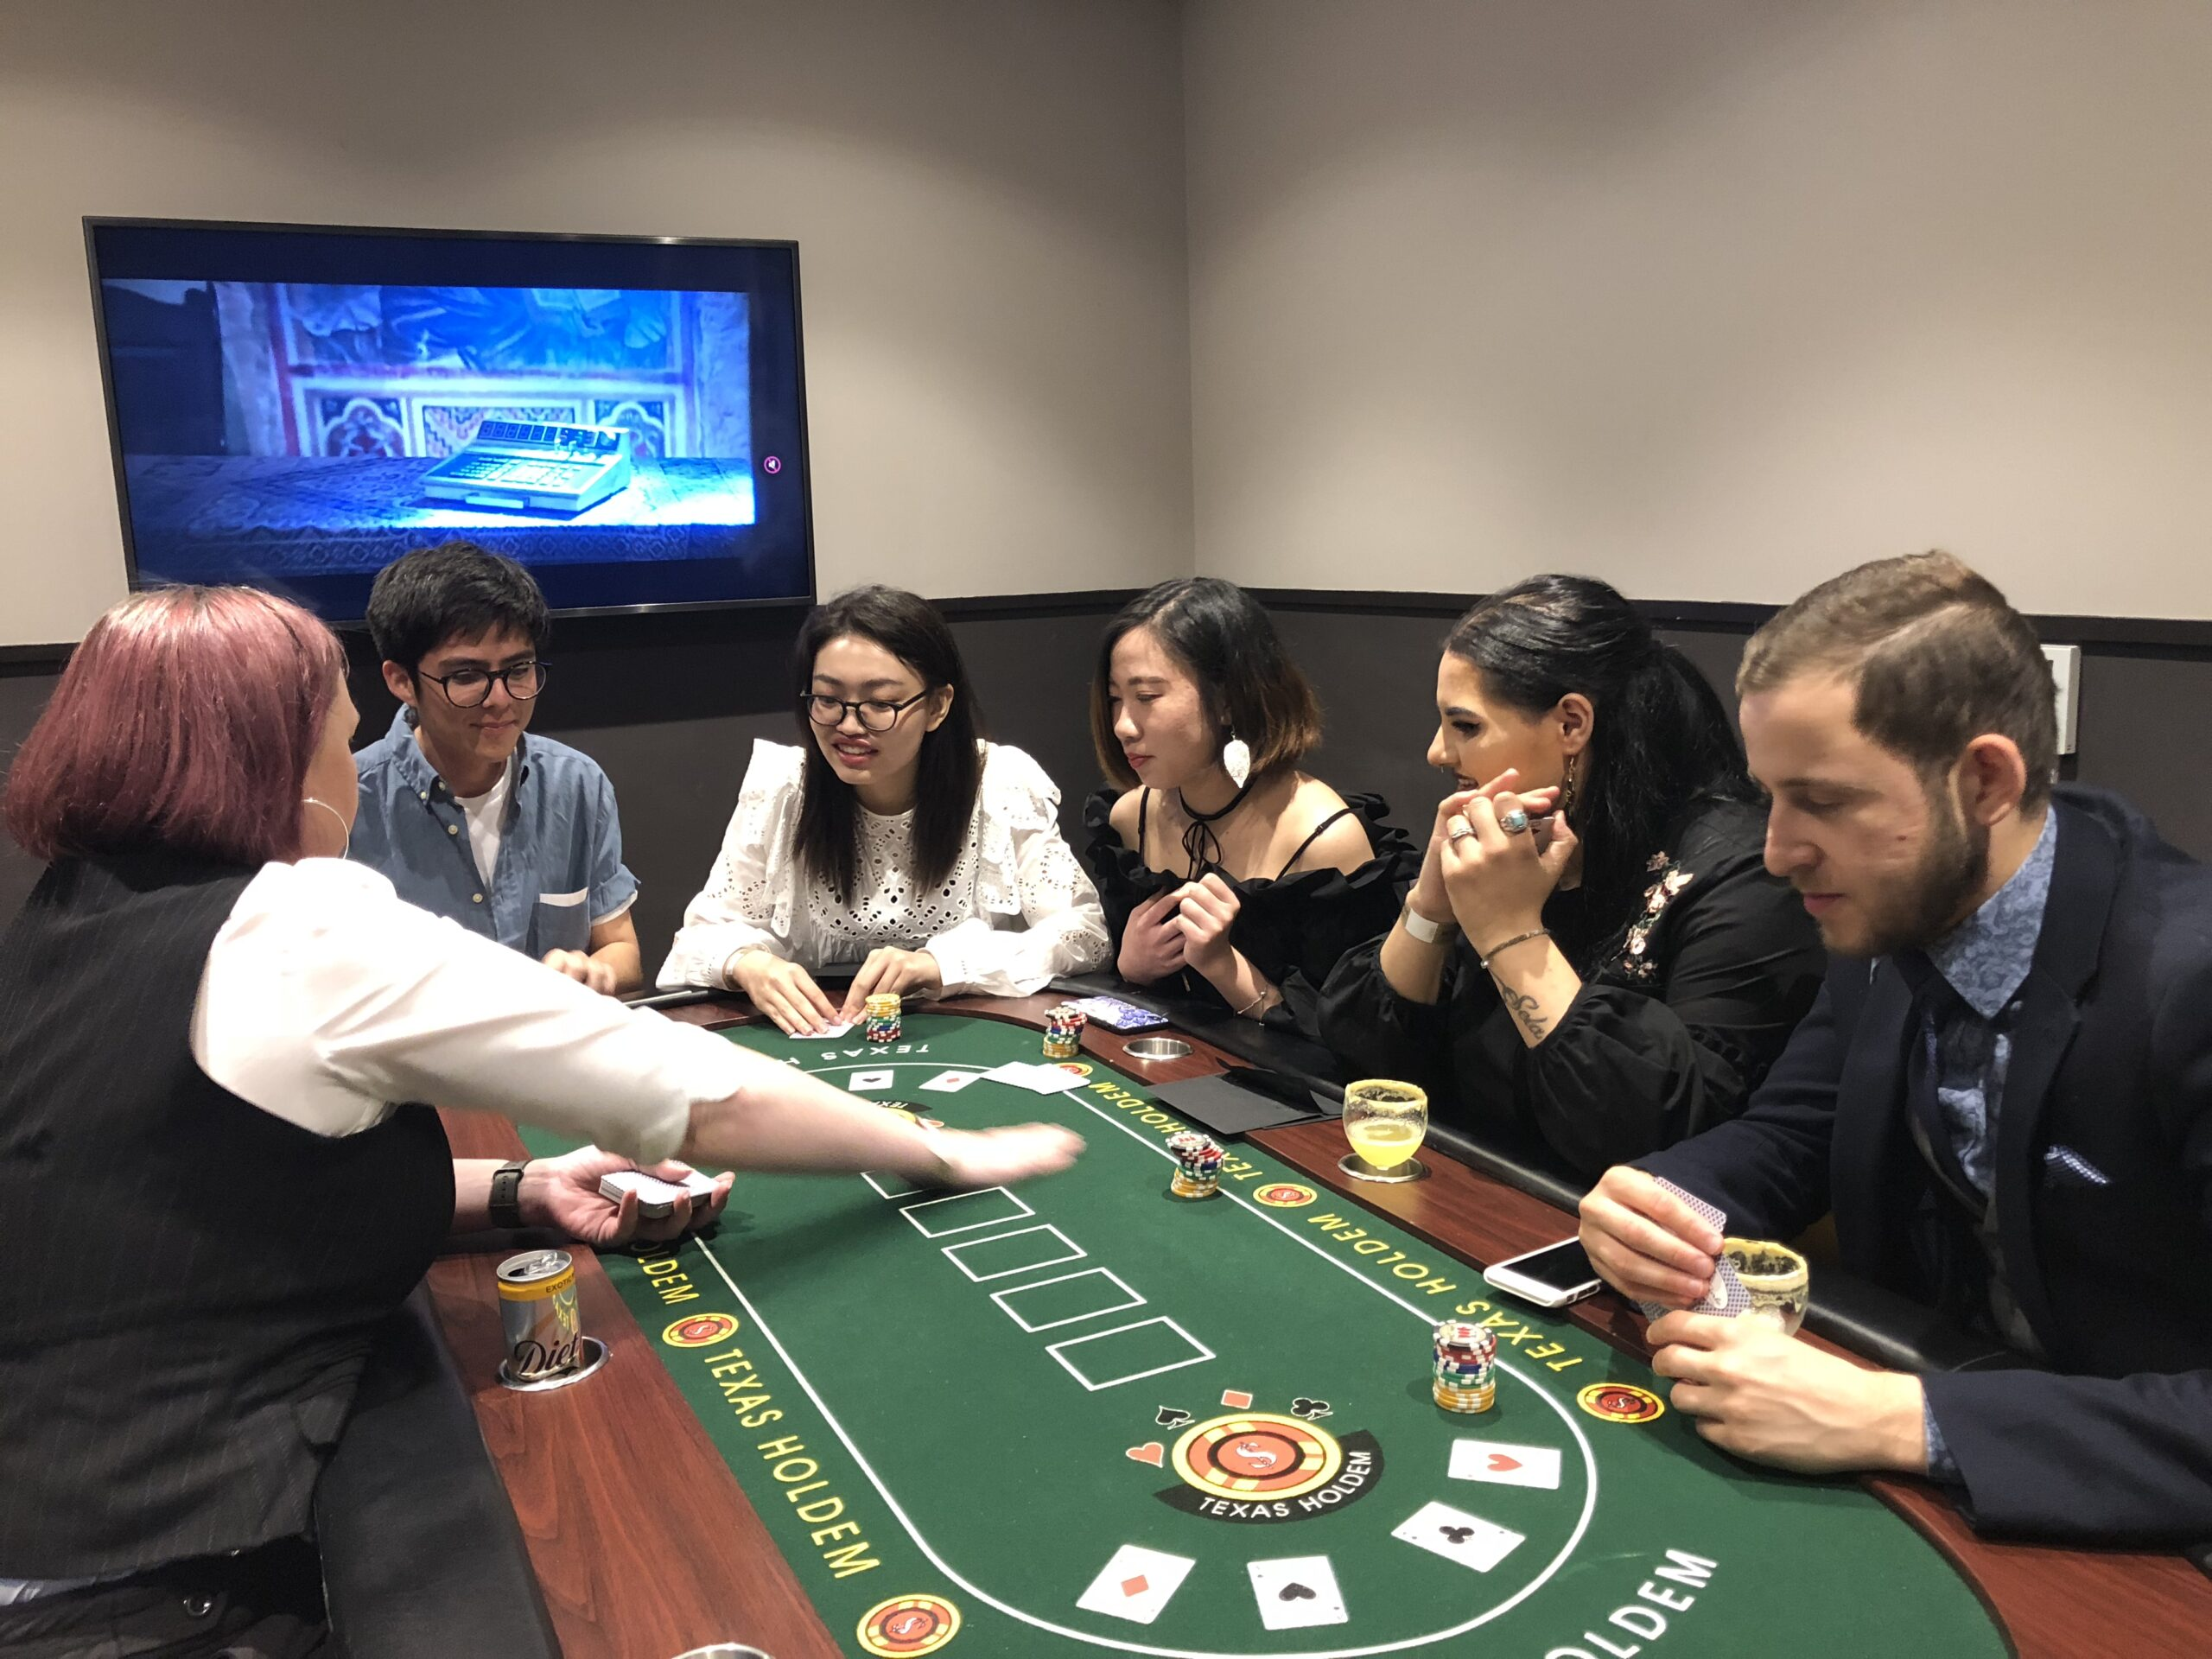 Fundamental poker principles of all times